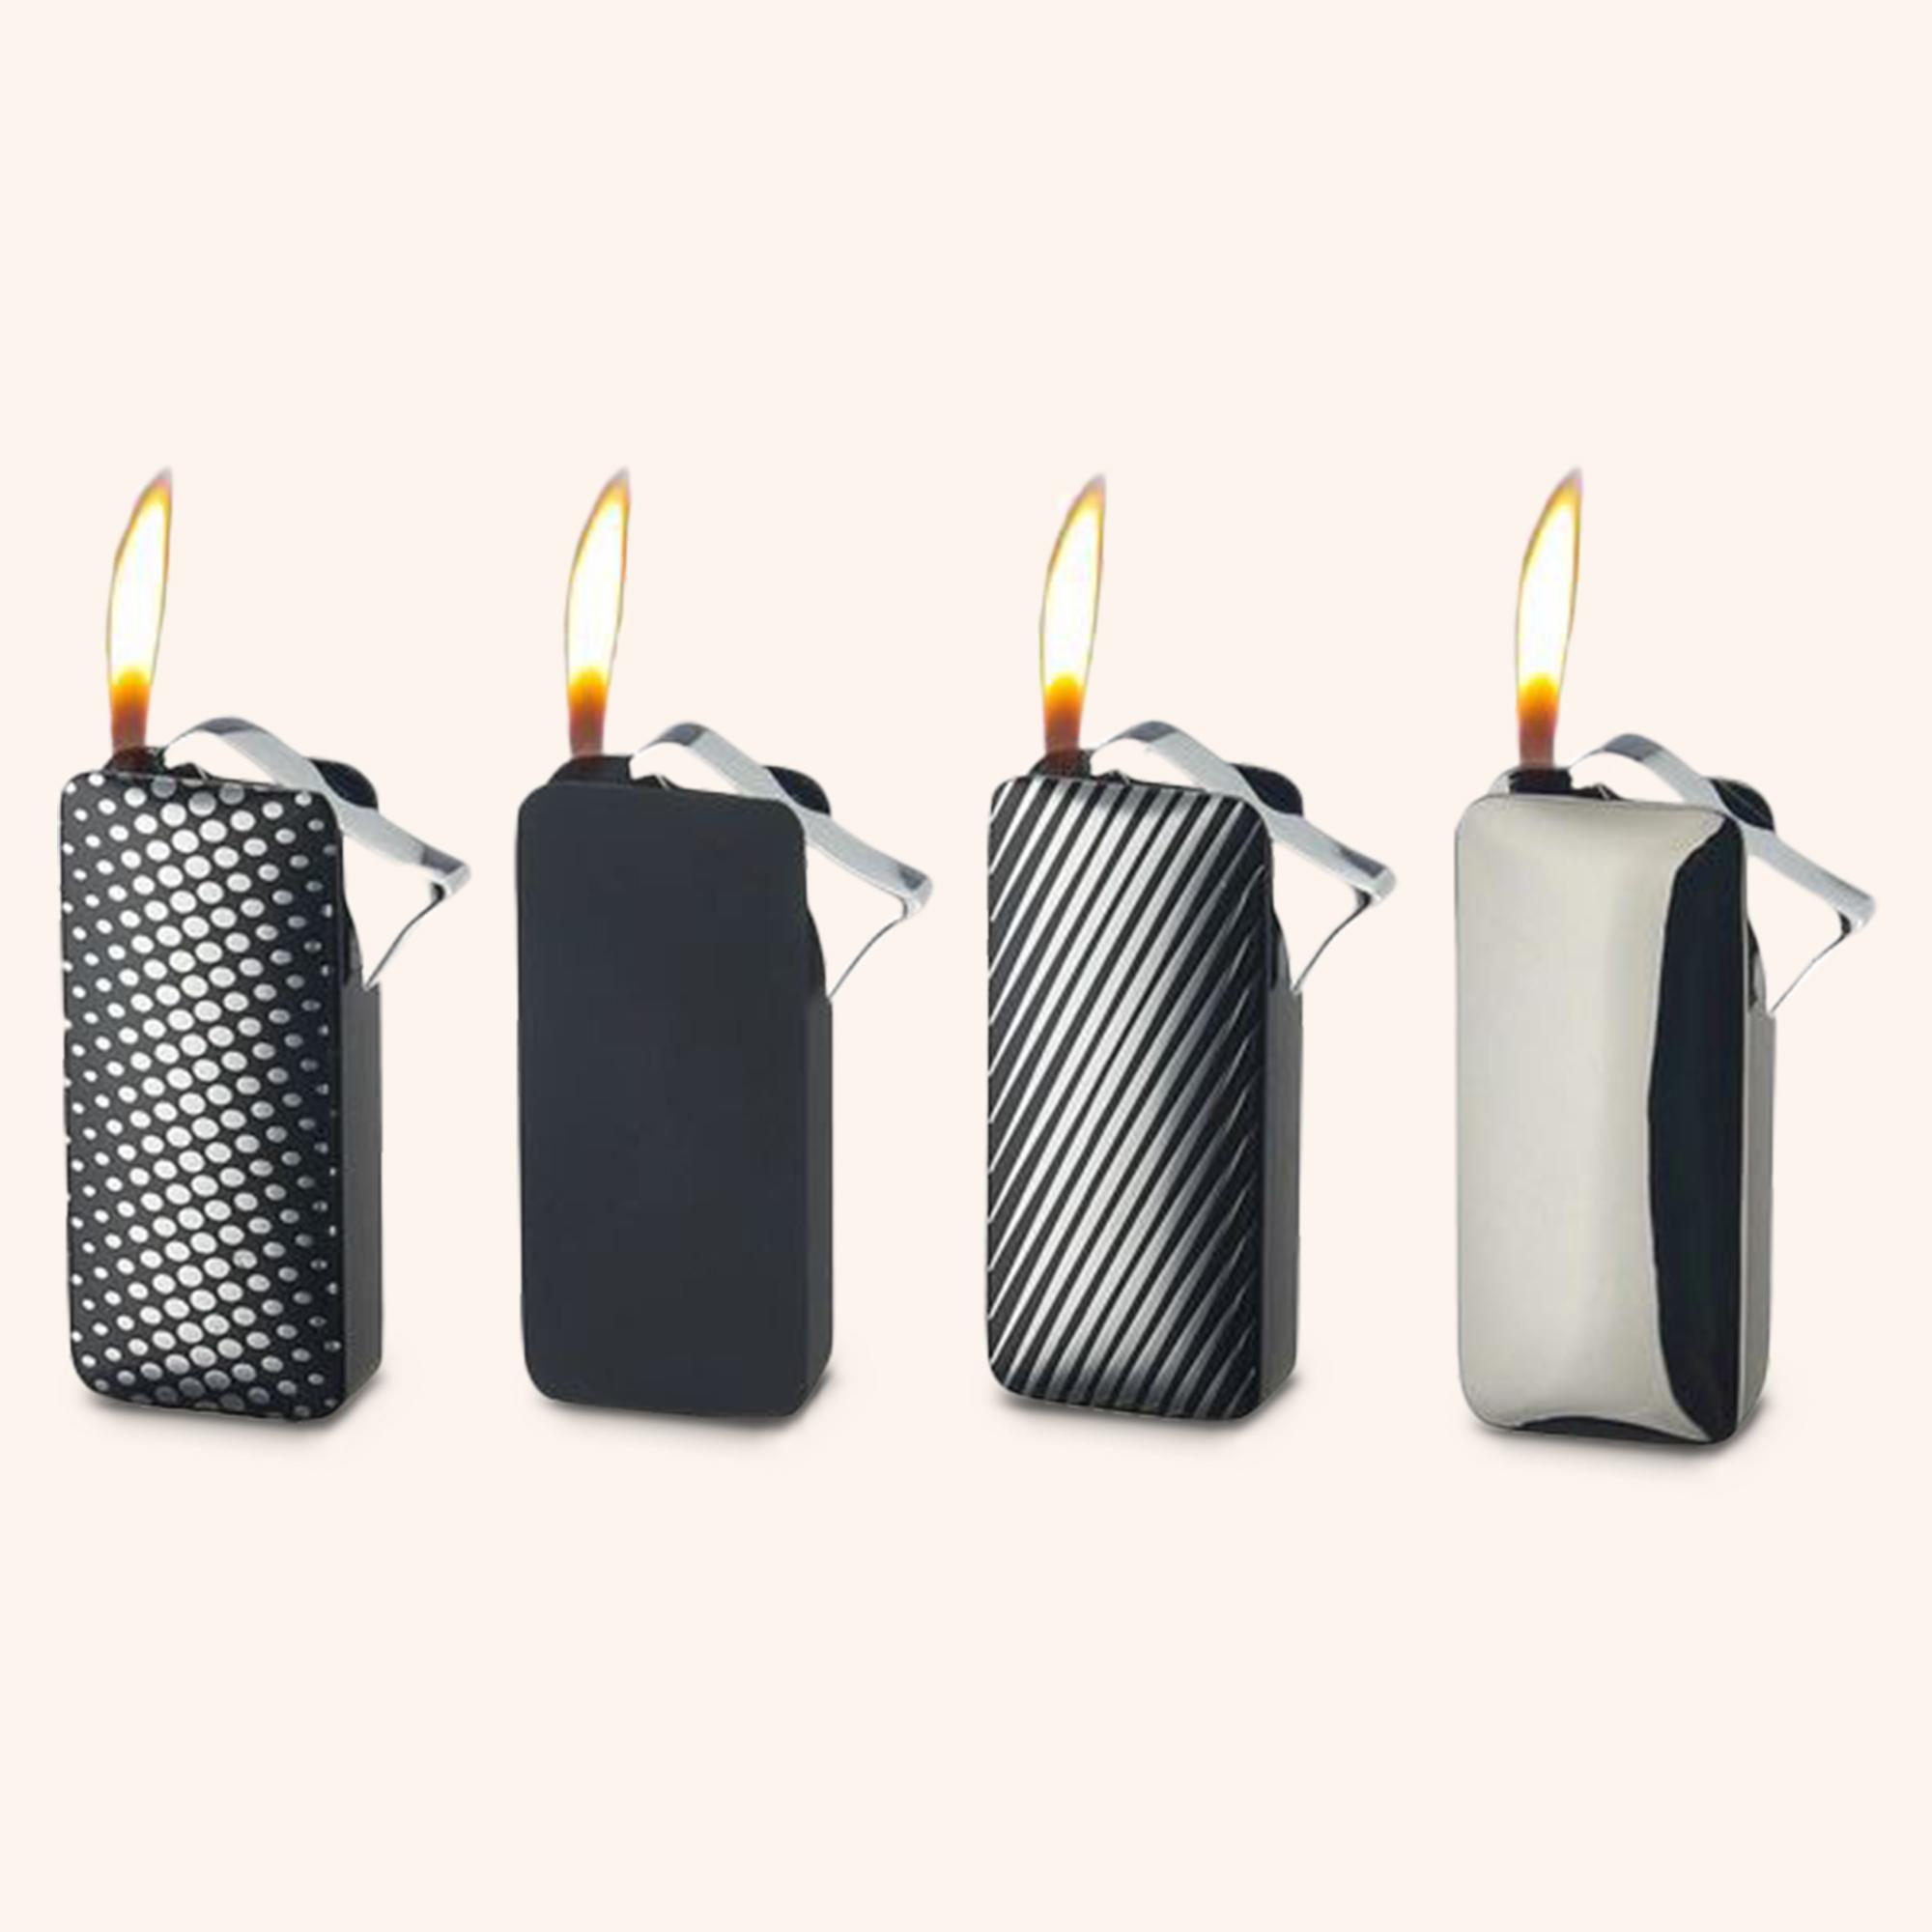 Piezo Lighter by MaXiM